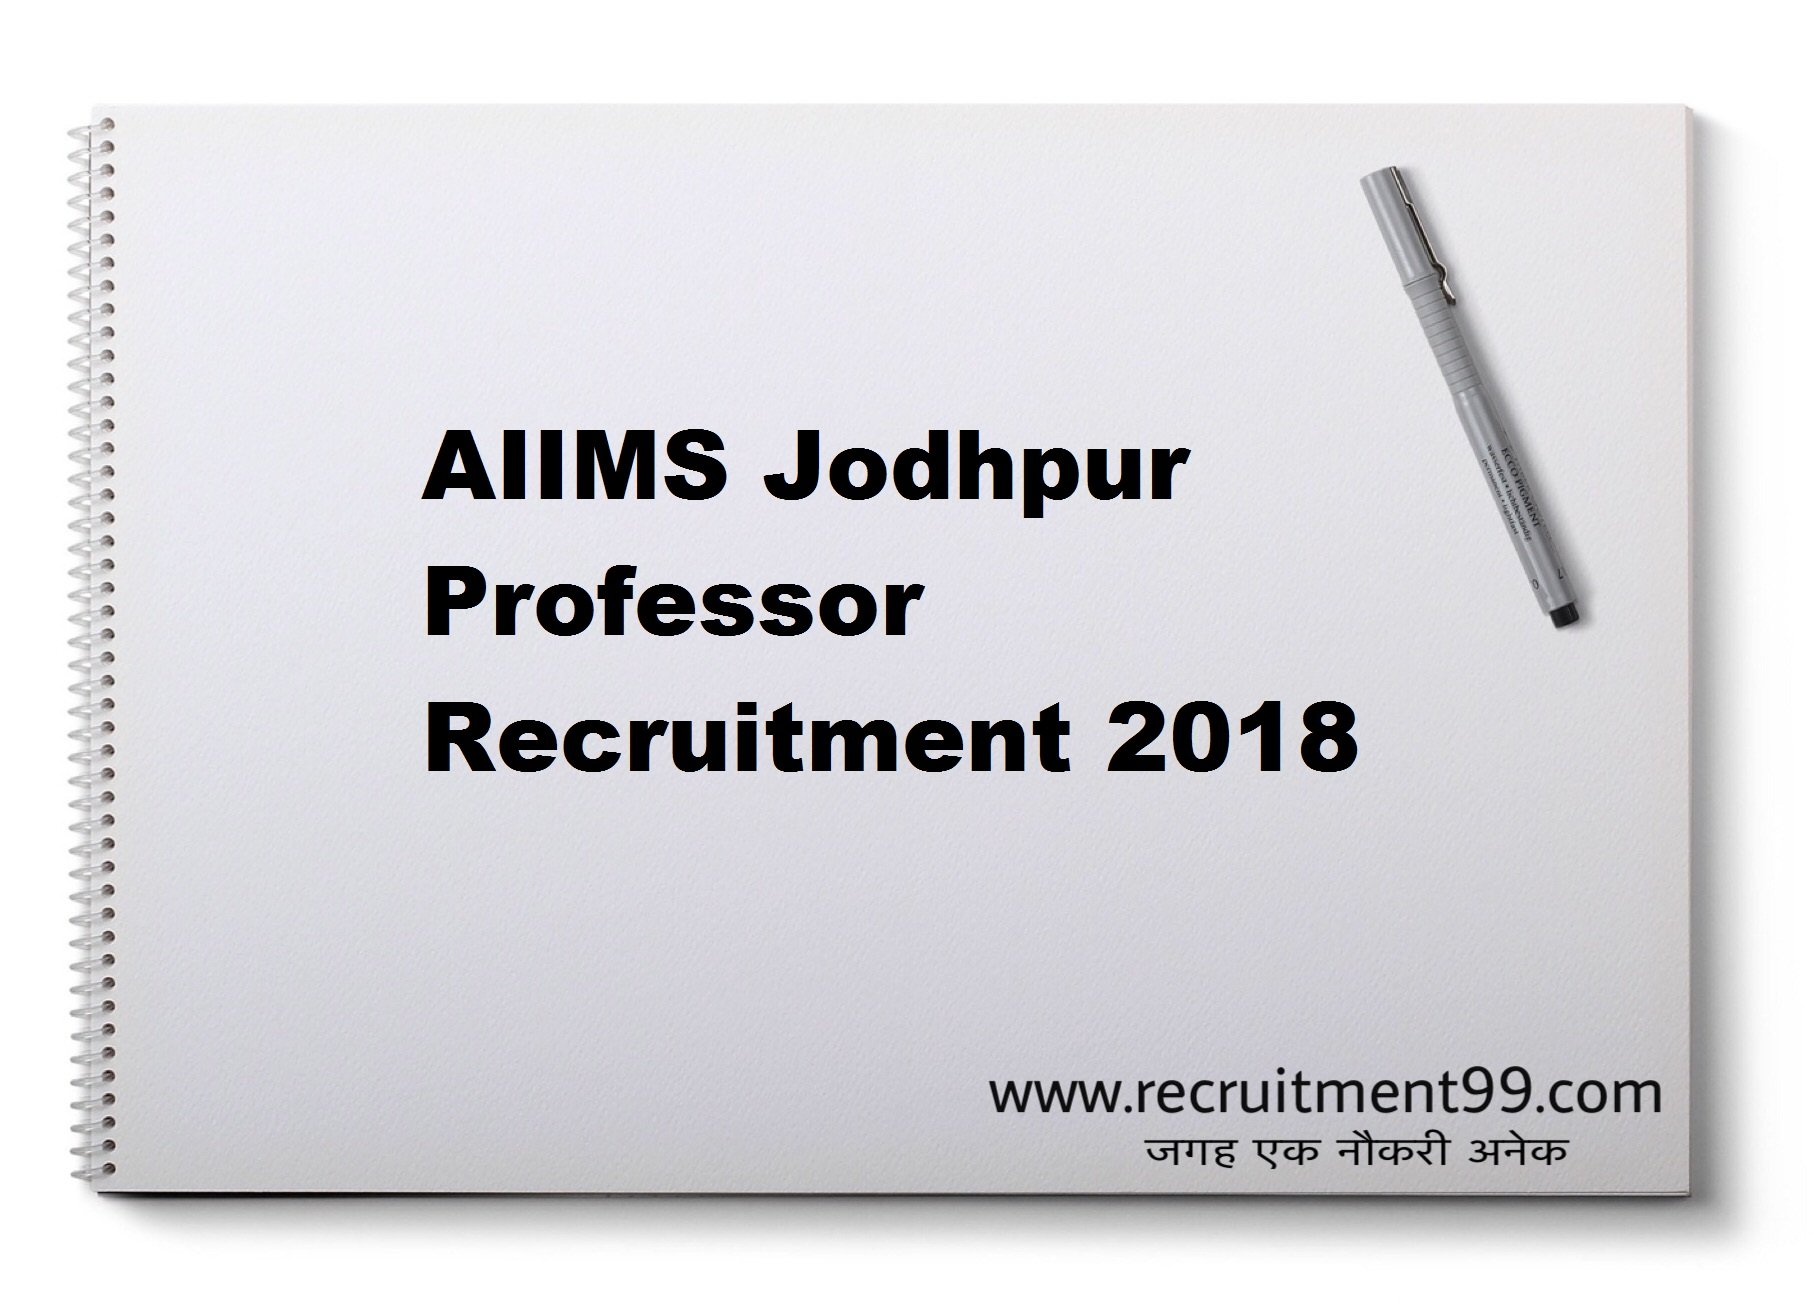 AIIMS Jodhpur Professor Recruitment Admit Card Result 2018